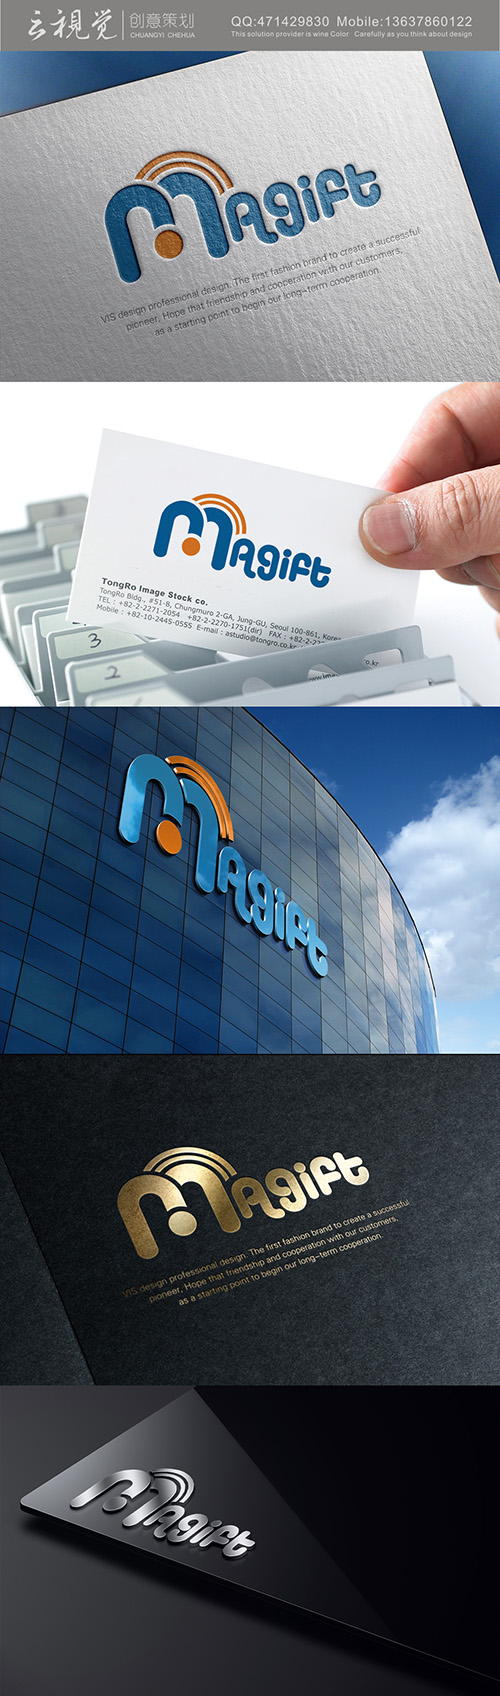 Magift蓝牙耳机品牌Logo设计_2943741_k68威客网